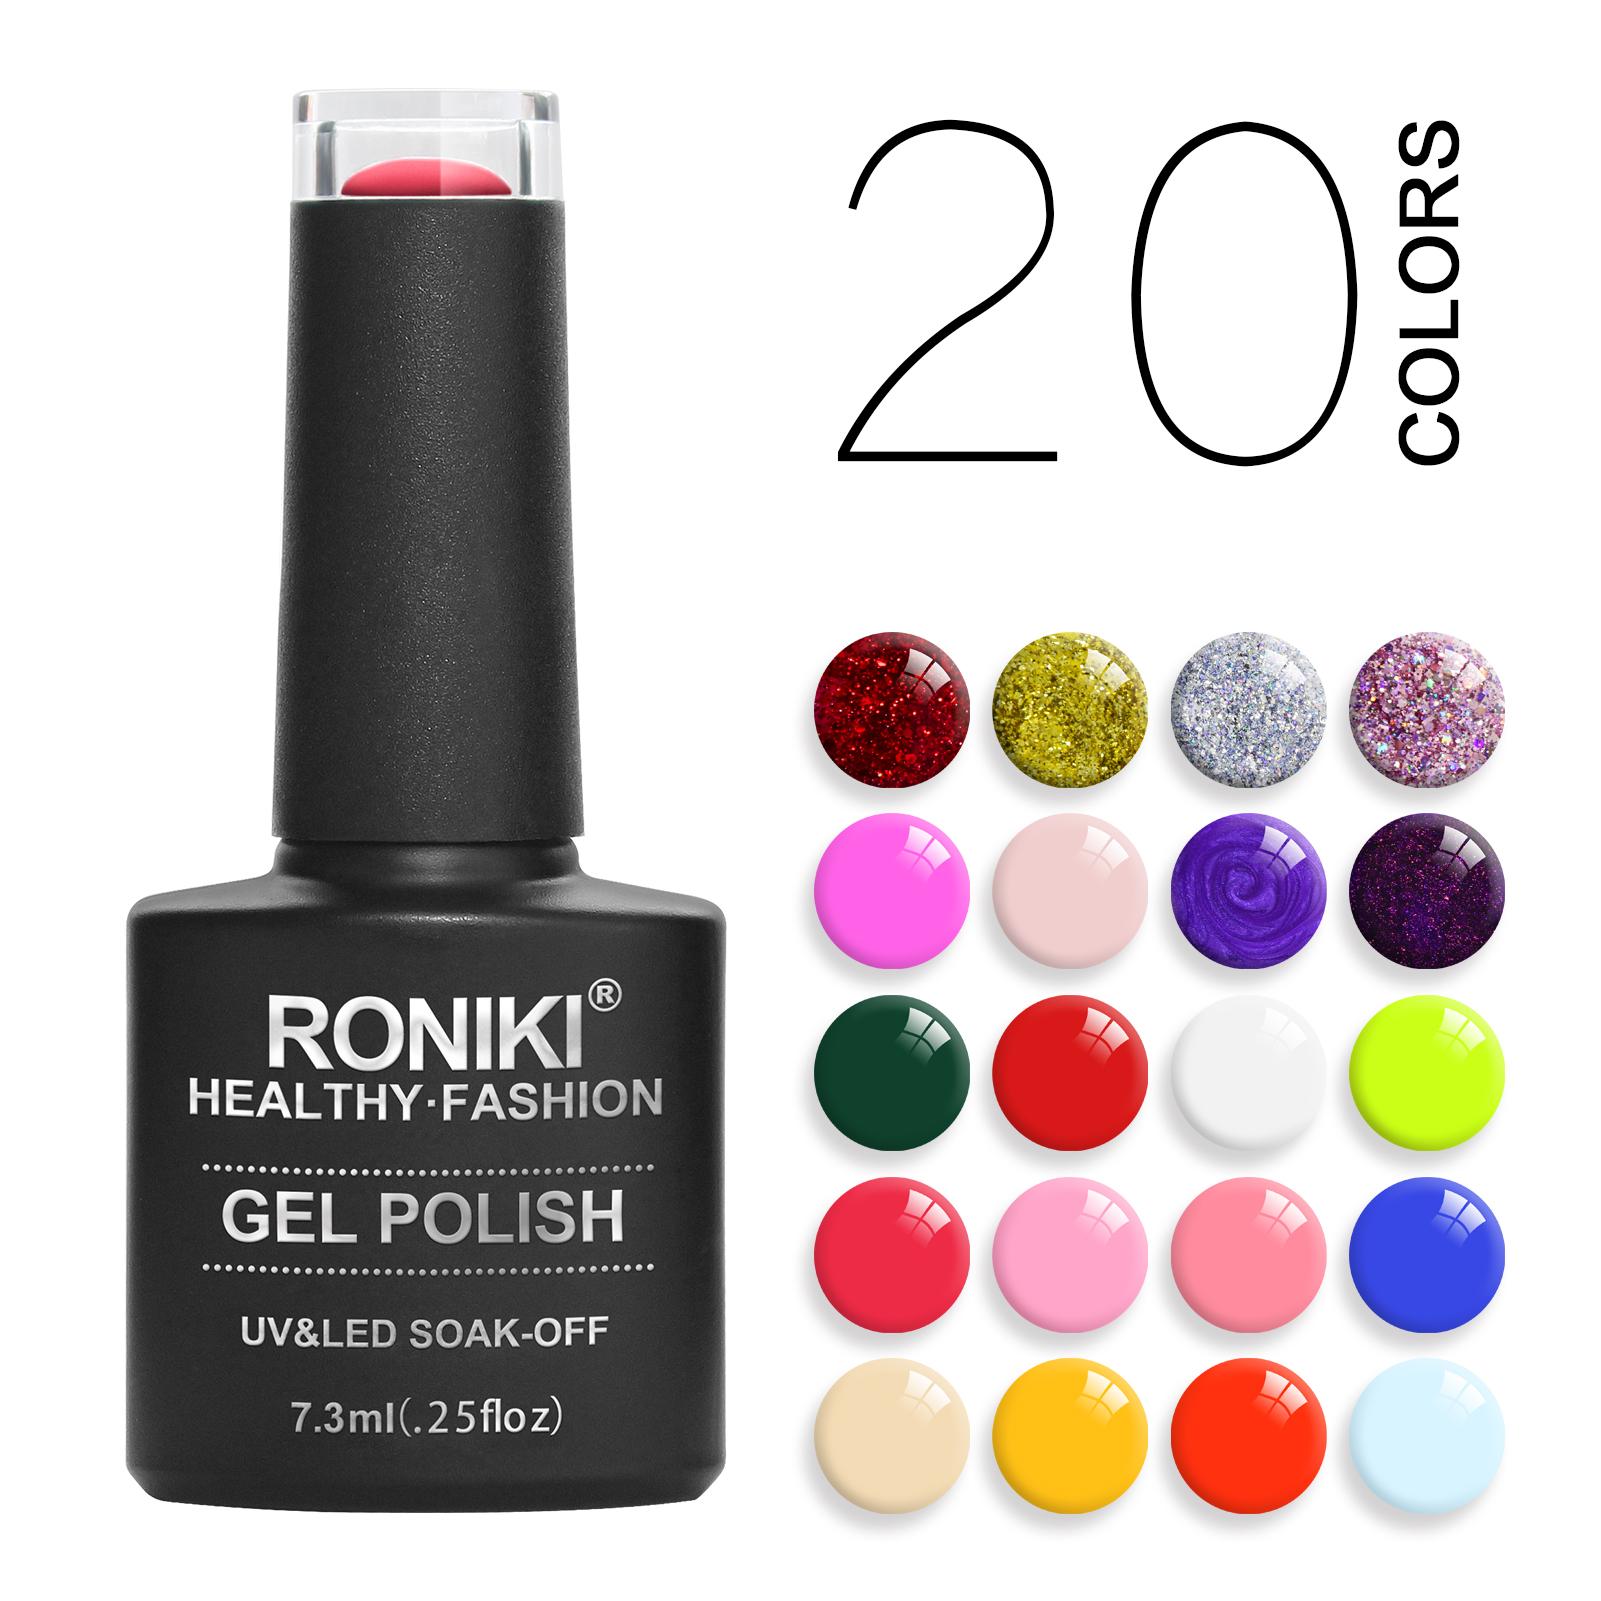 RONIKI Newest Acrylic Nail Gel Polish kit Colors Non Toxic Soak off Learner Manicure Private label UV Gel nail polish set